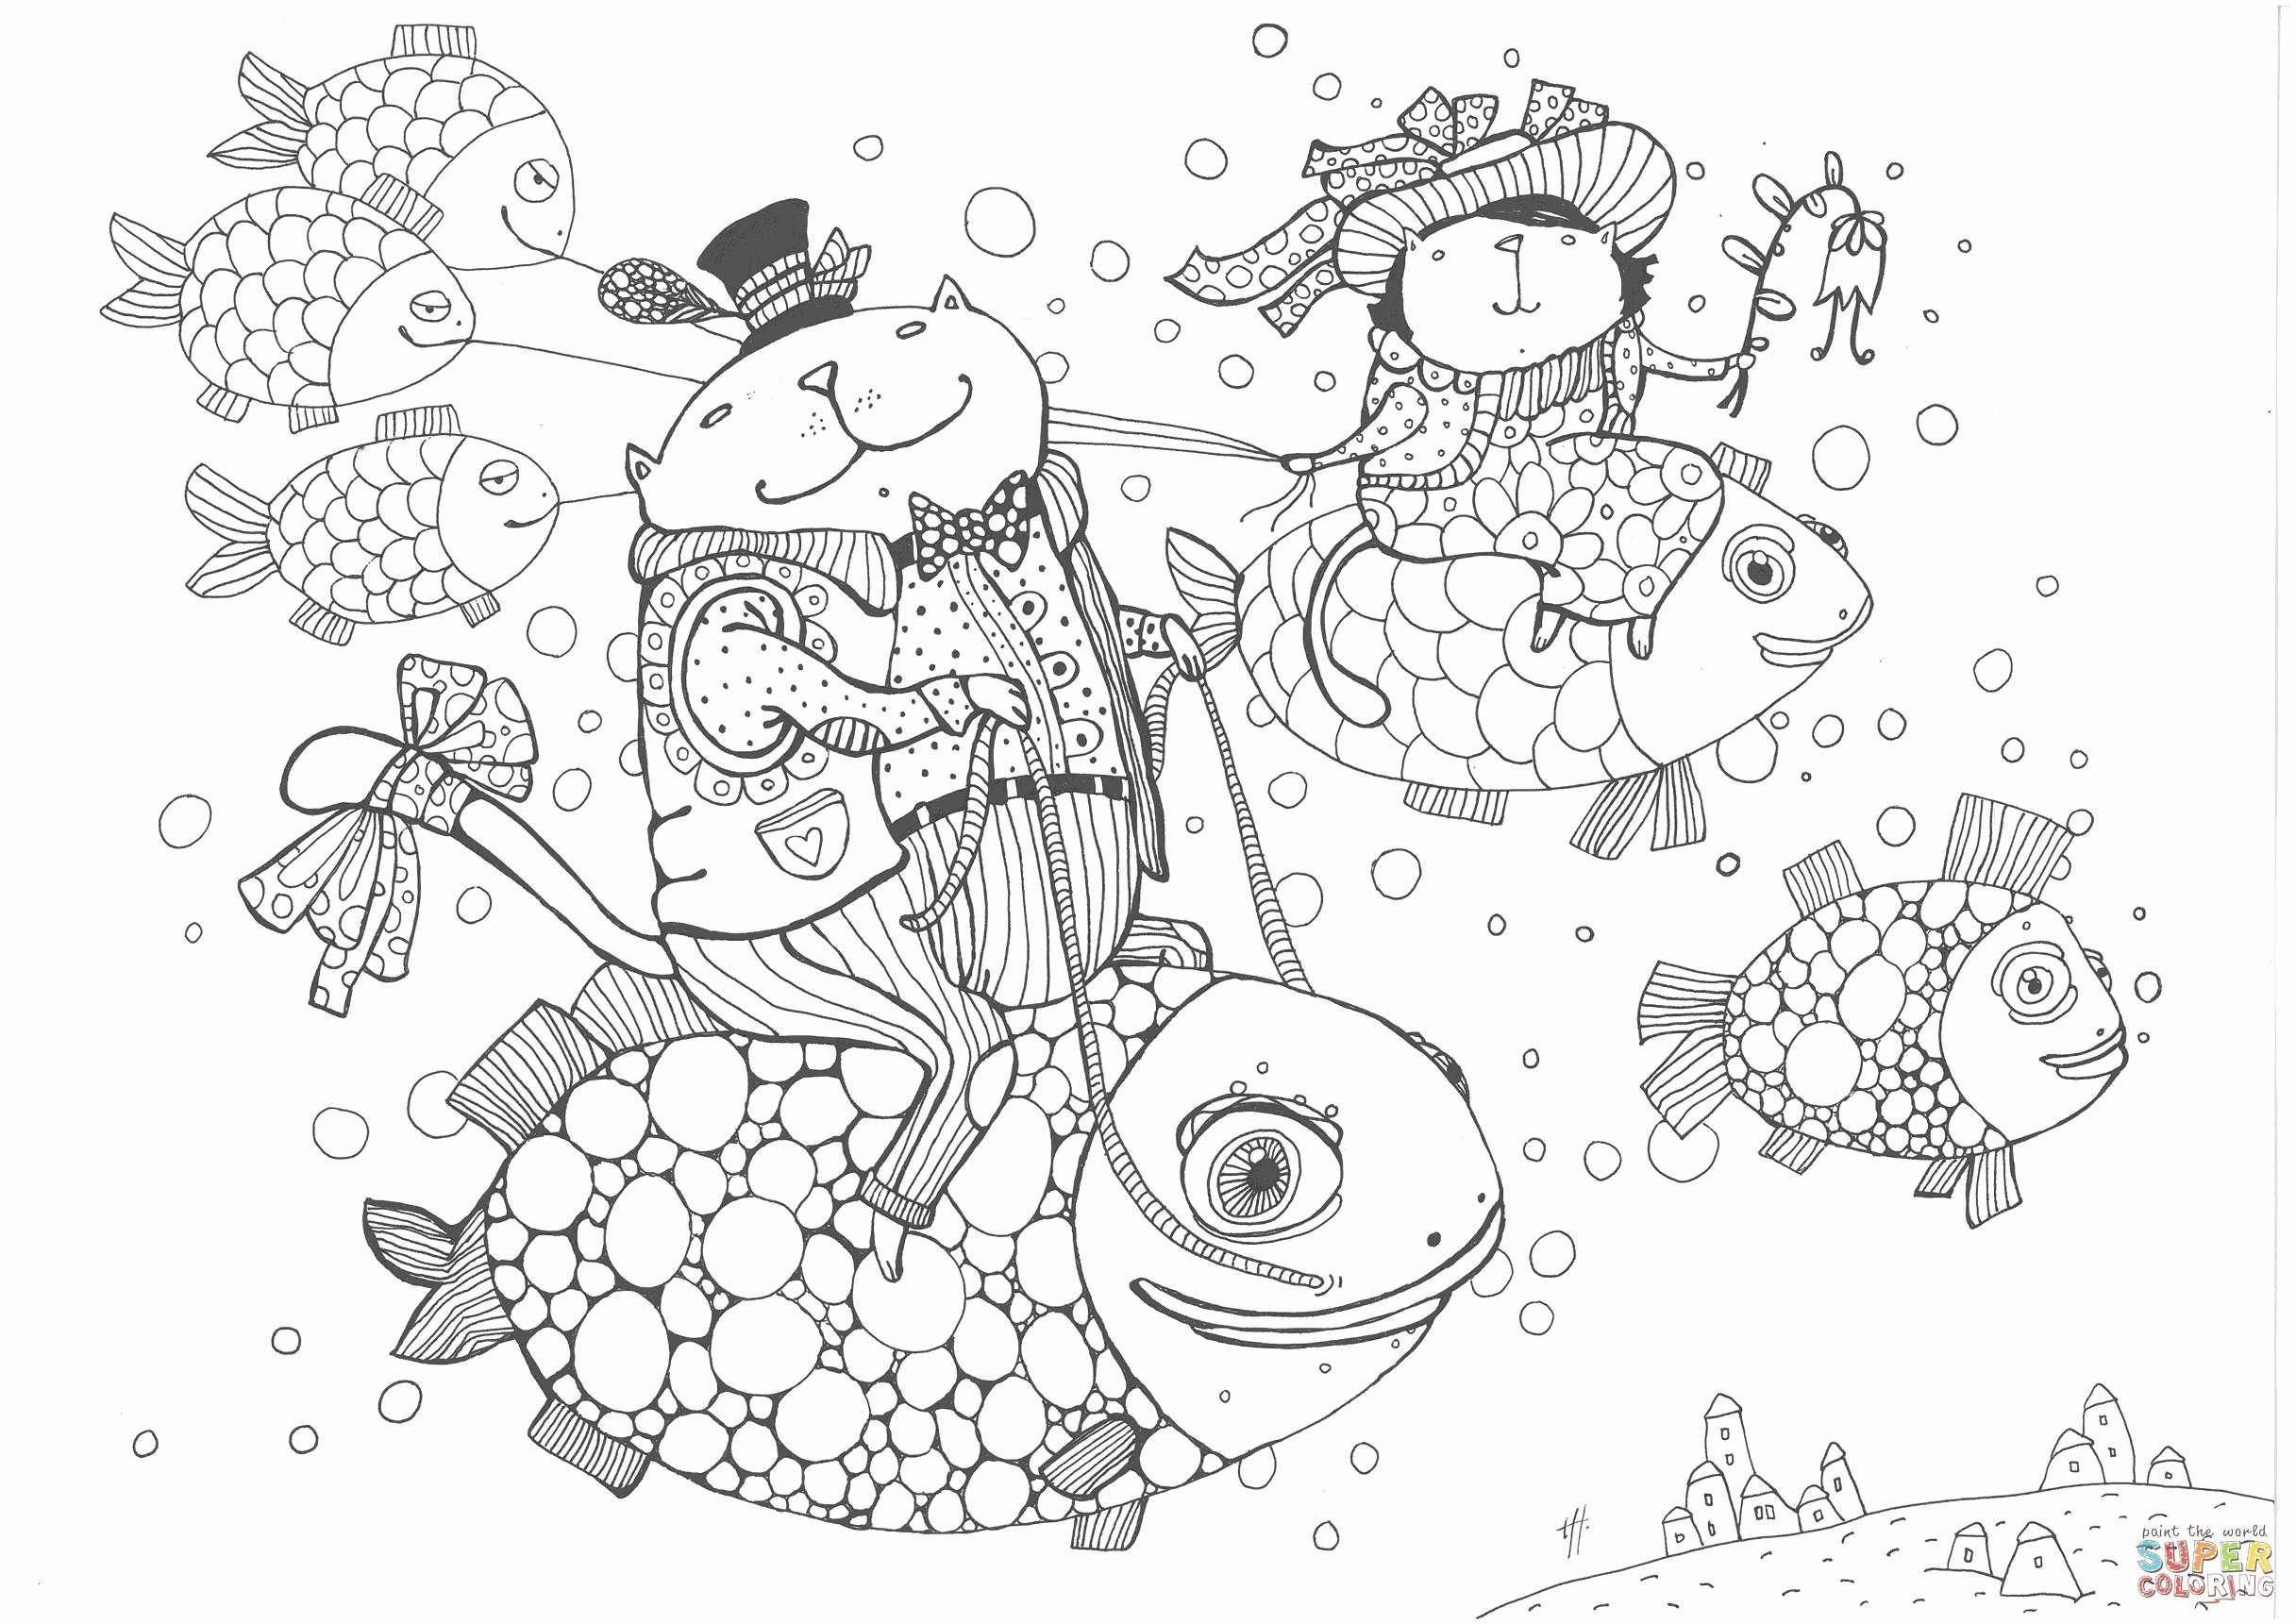 Minni Maus Malvorlage Genial Minni Maus Baby Malvorlagen Genial Minnie Mouse Malvorlagen Elegant Galerie